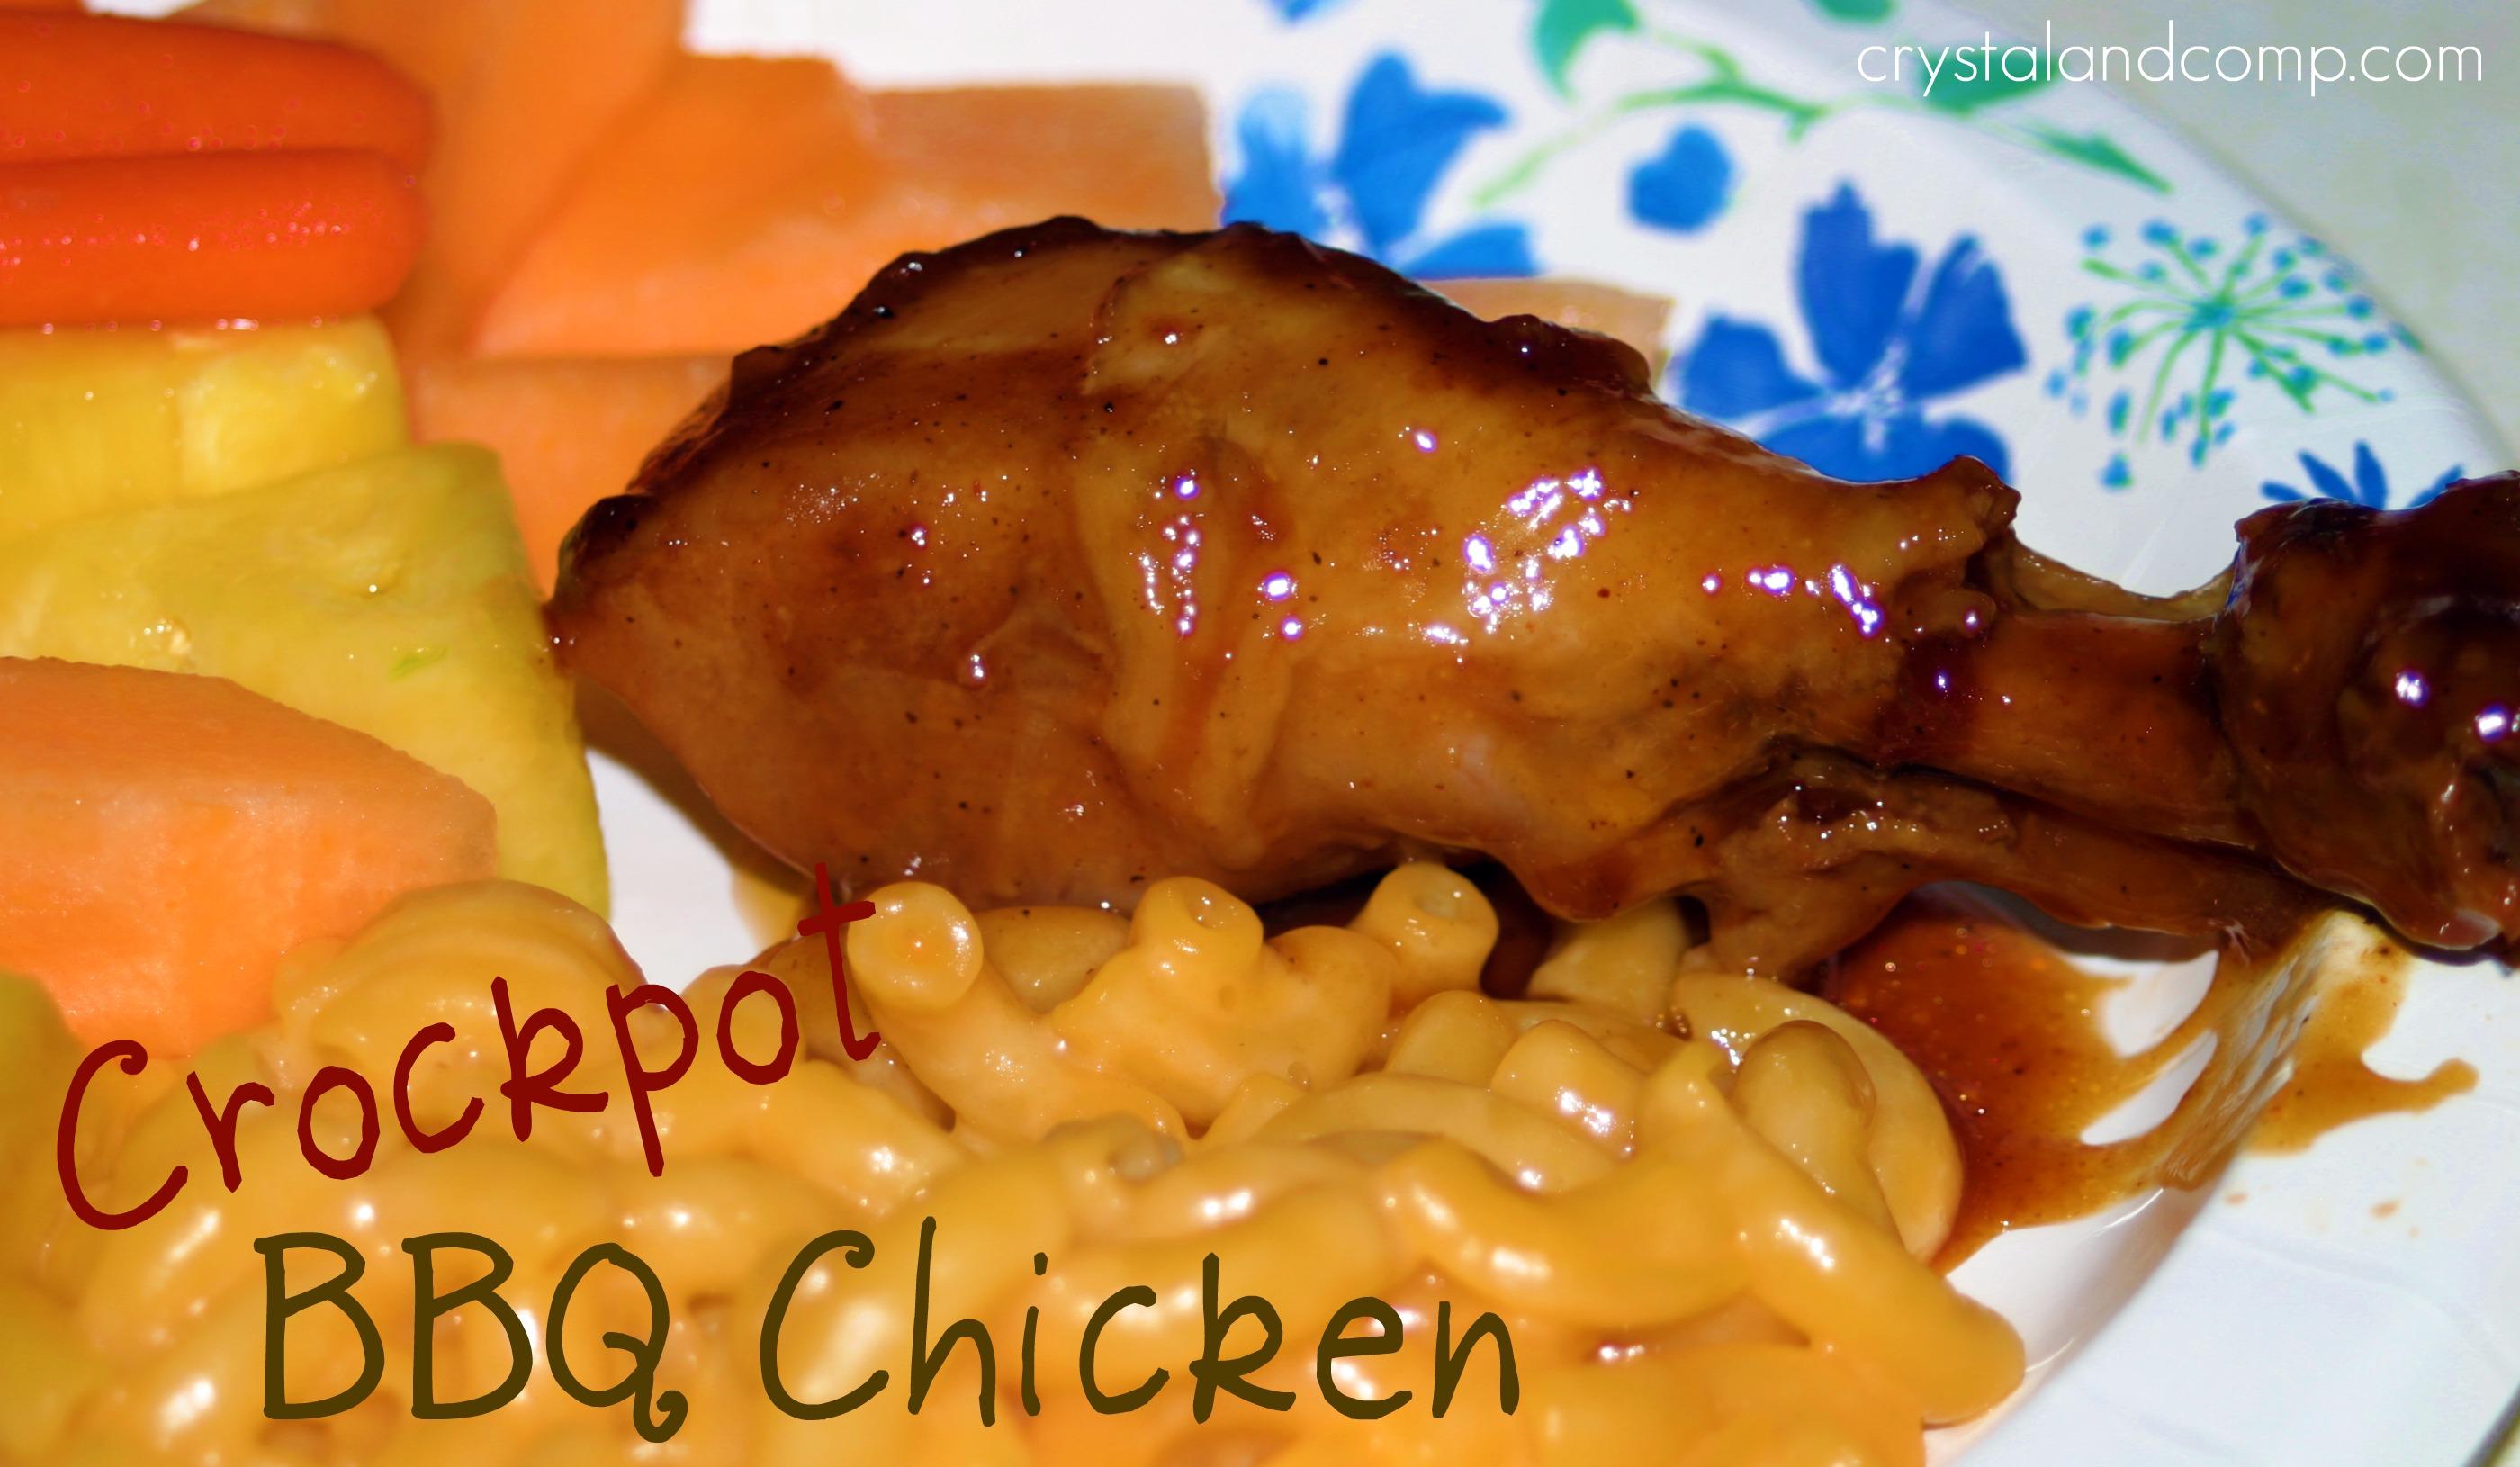 Easy Recipes Crockpot Bbq Chicken Crystalandcomp Com